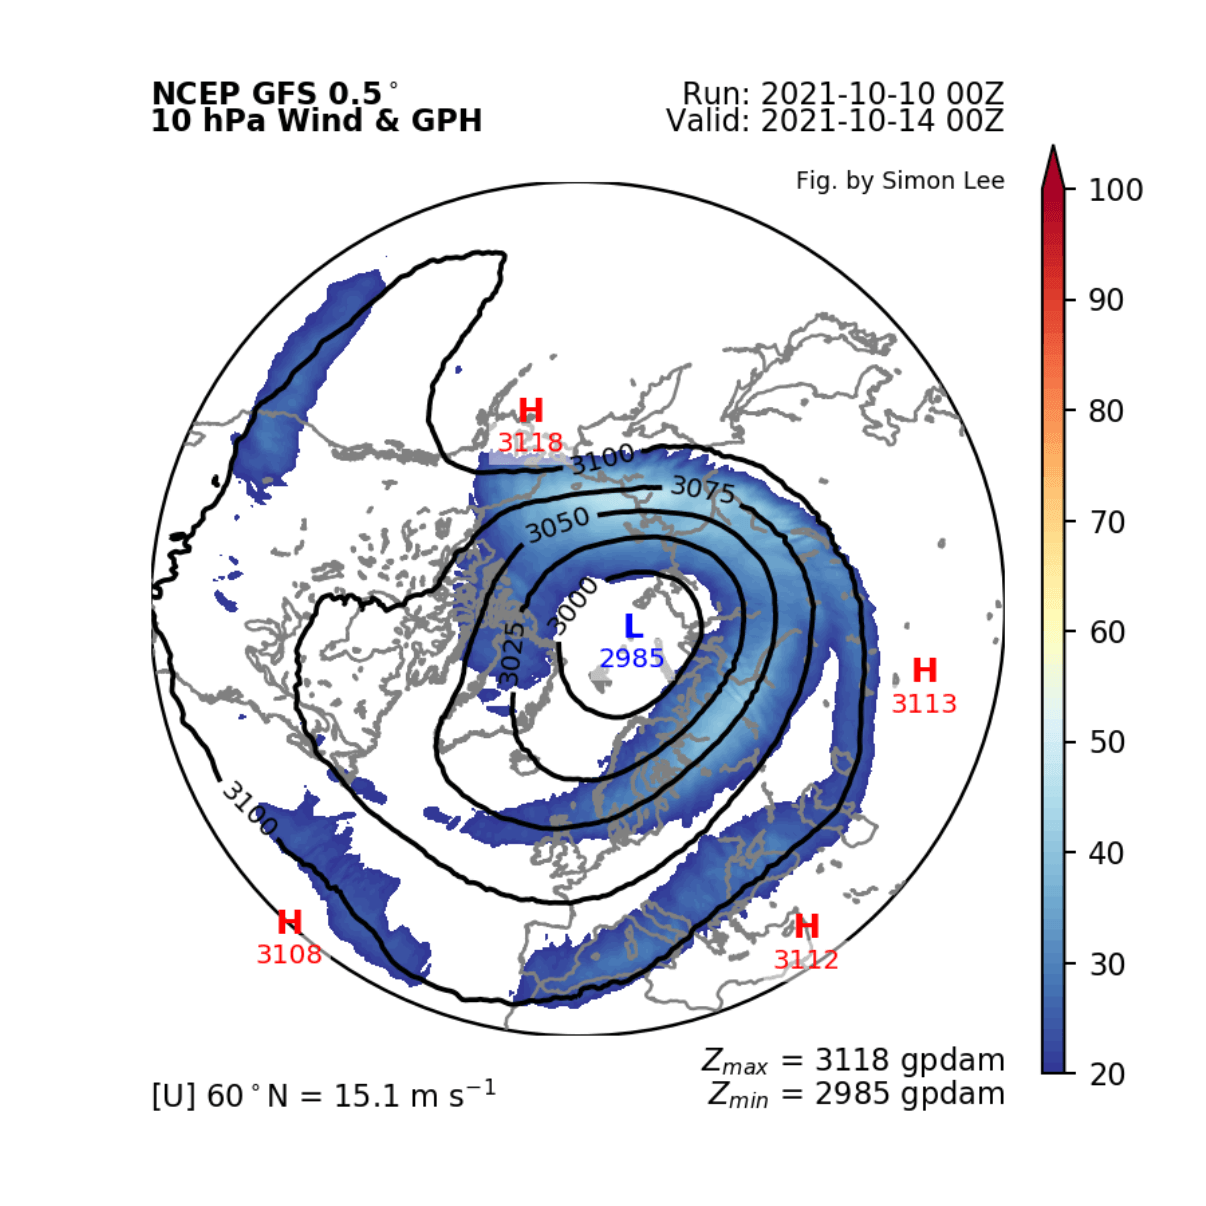 stratospheric-warming-forecast-fall-winter-2021-2022-united-states-europe